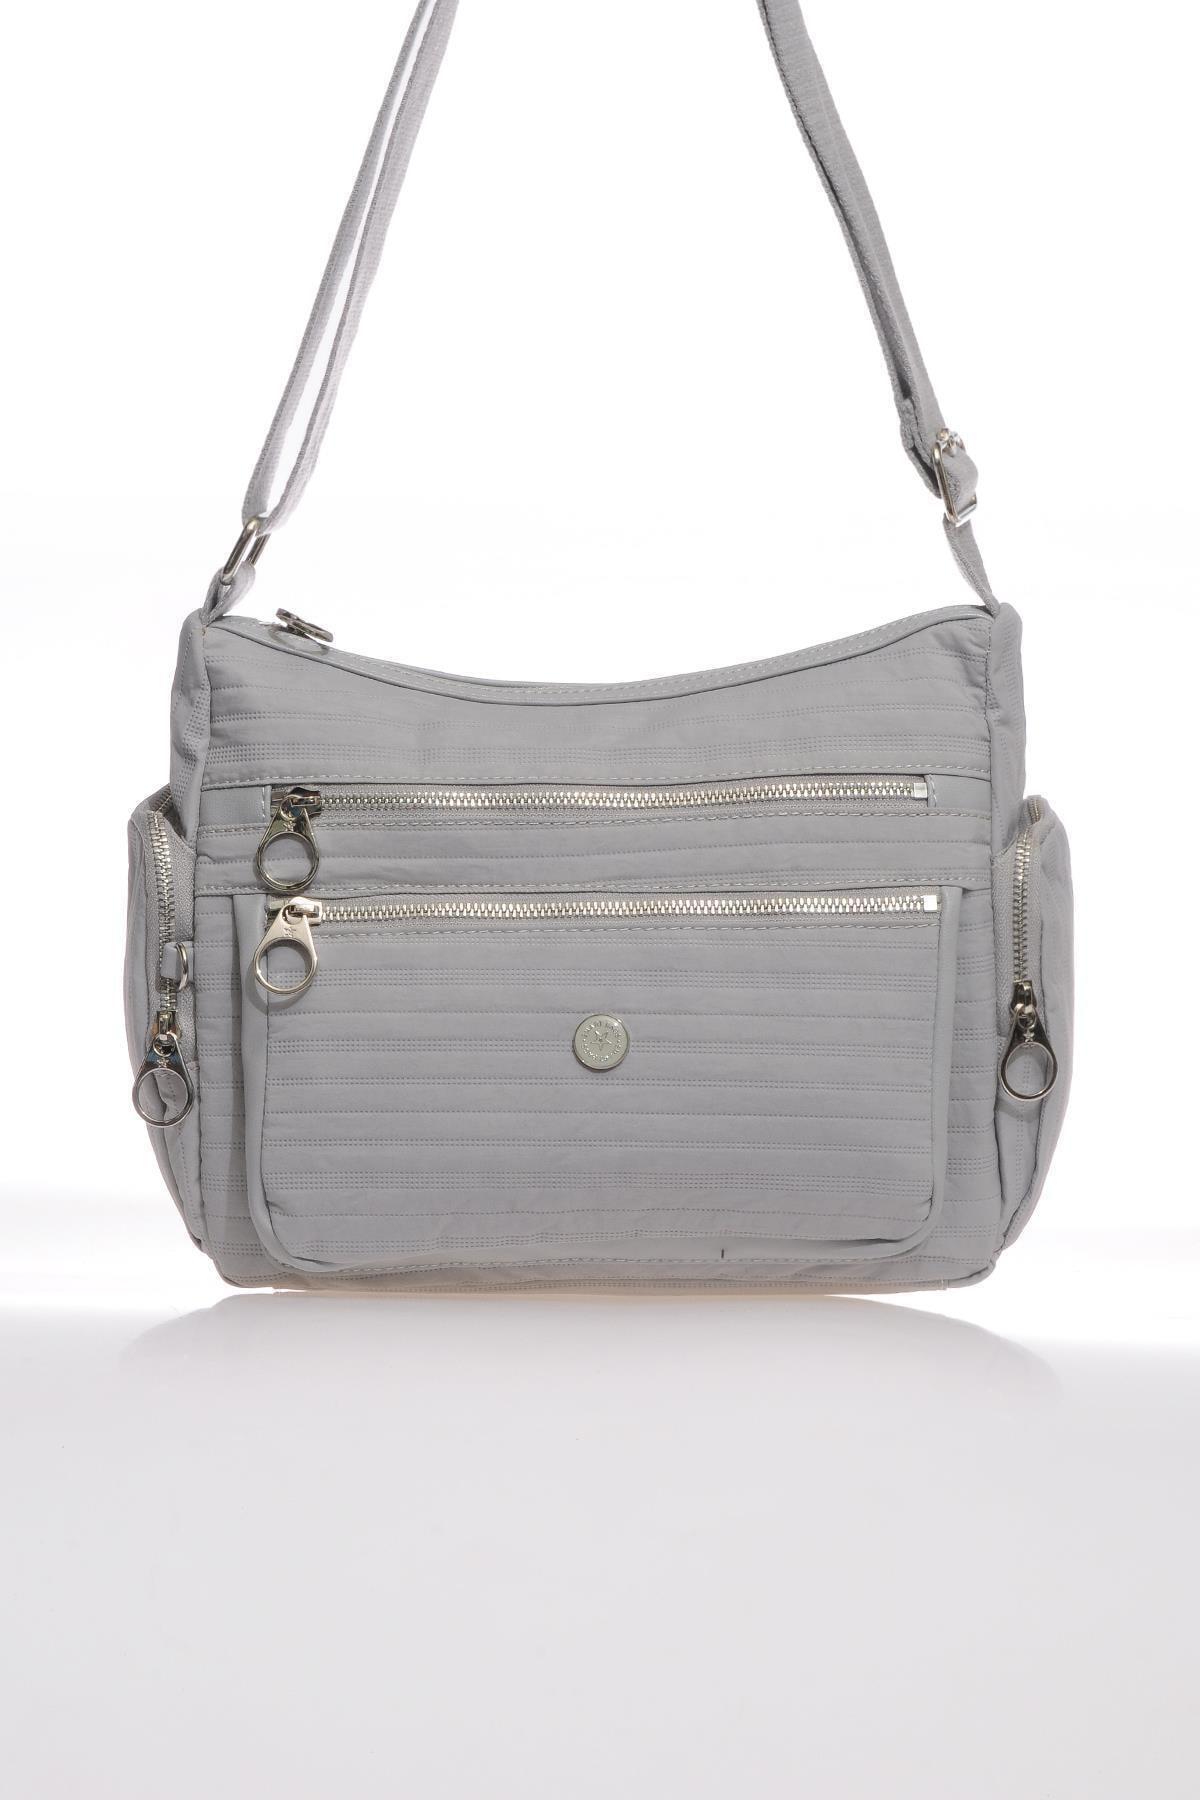 Smart Bags Smb3007-0078 Gri Kadın Çapraz Çanta